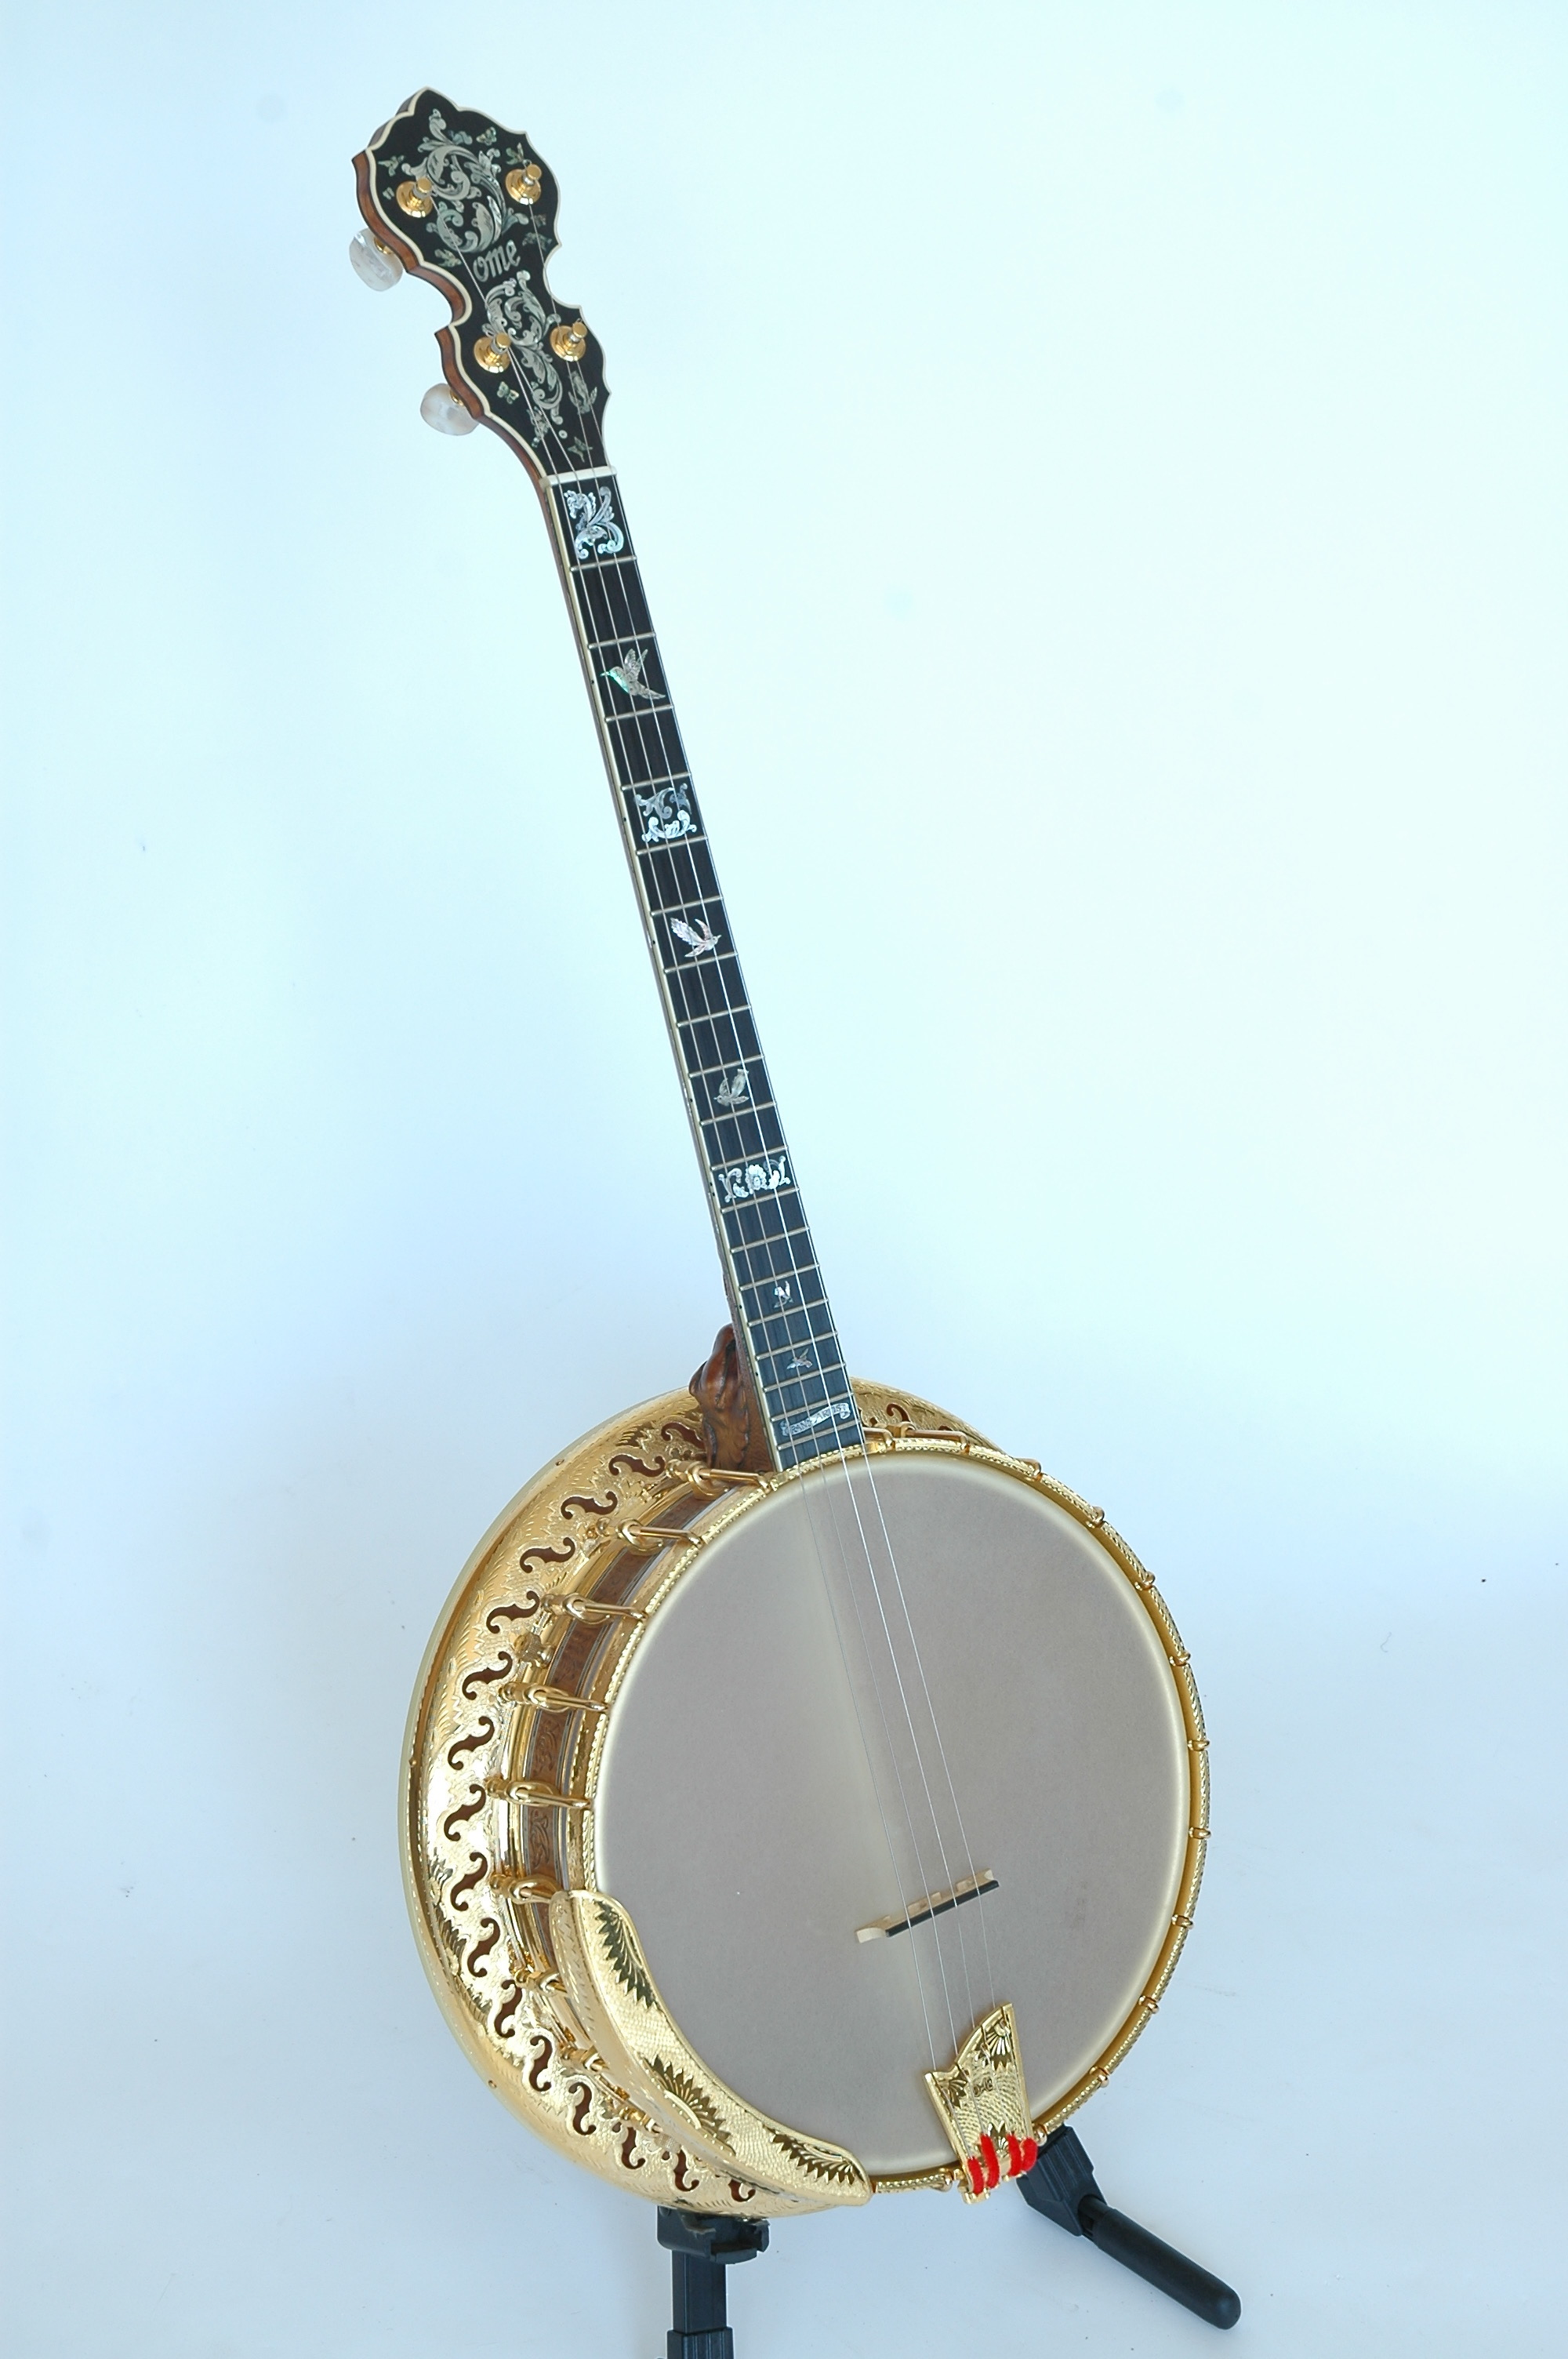 Ome Grand Artist Spring Banjo Front